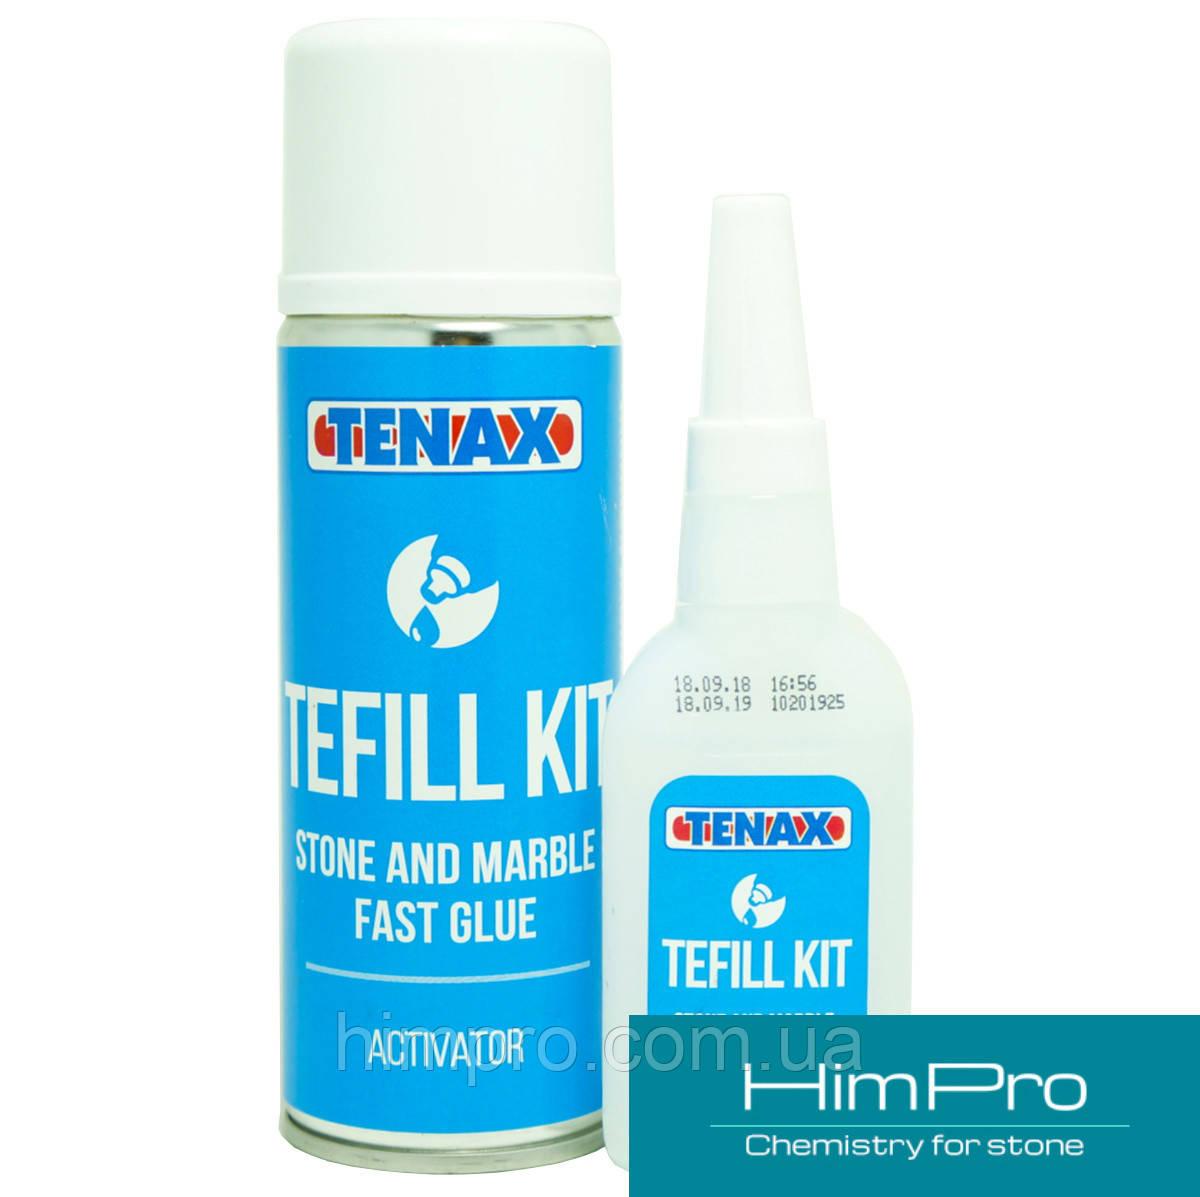 TEFILL KIT Tenax цианоакрилатовый клей с отвердителем (бесцветный 50mm + 200mm)